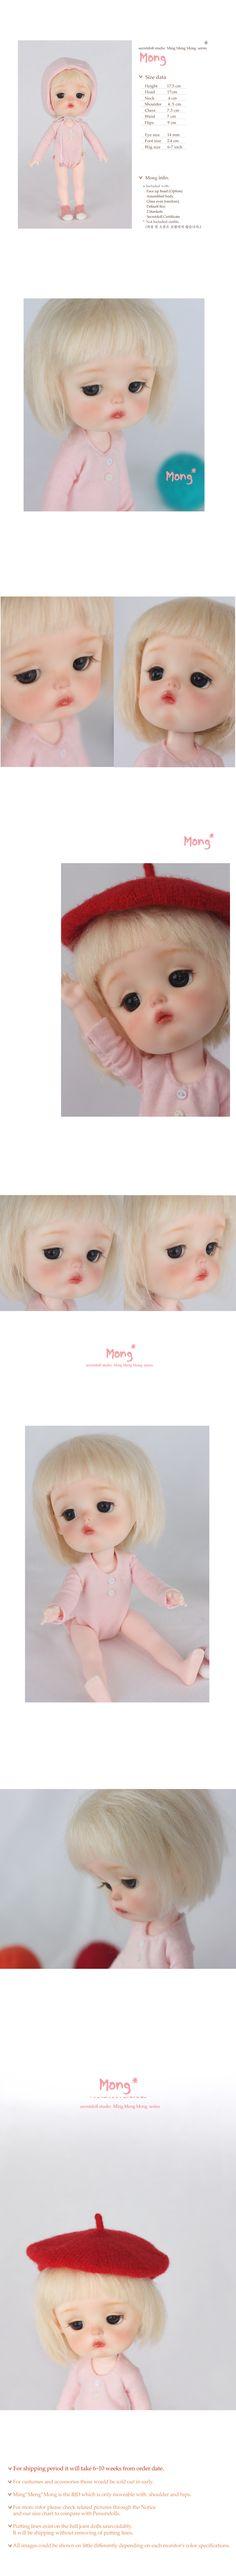 secretdoll [Mong]